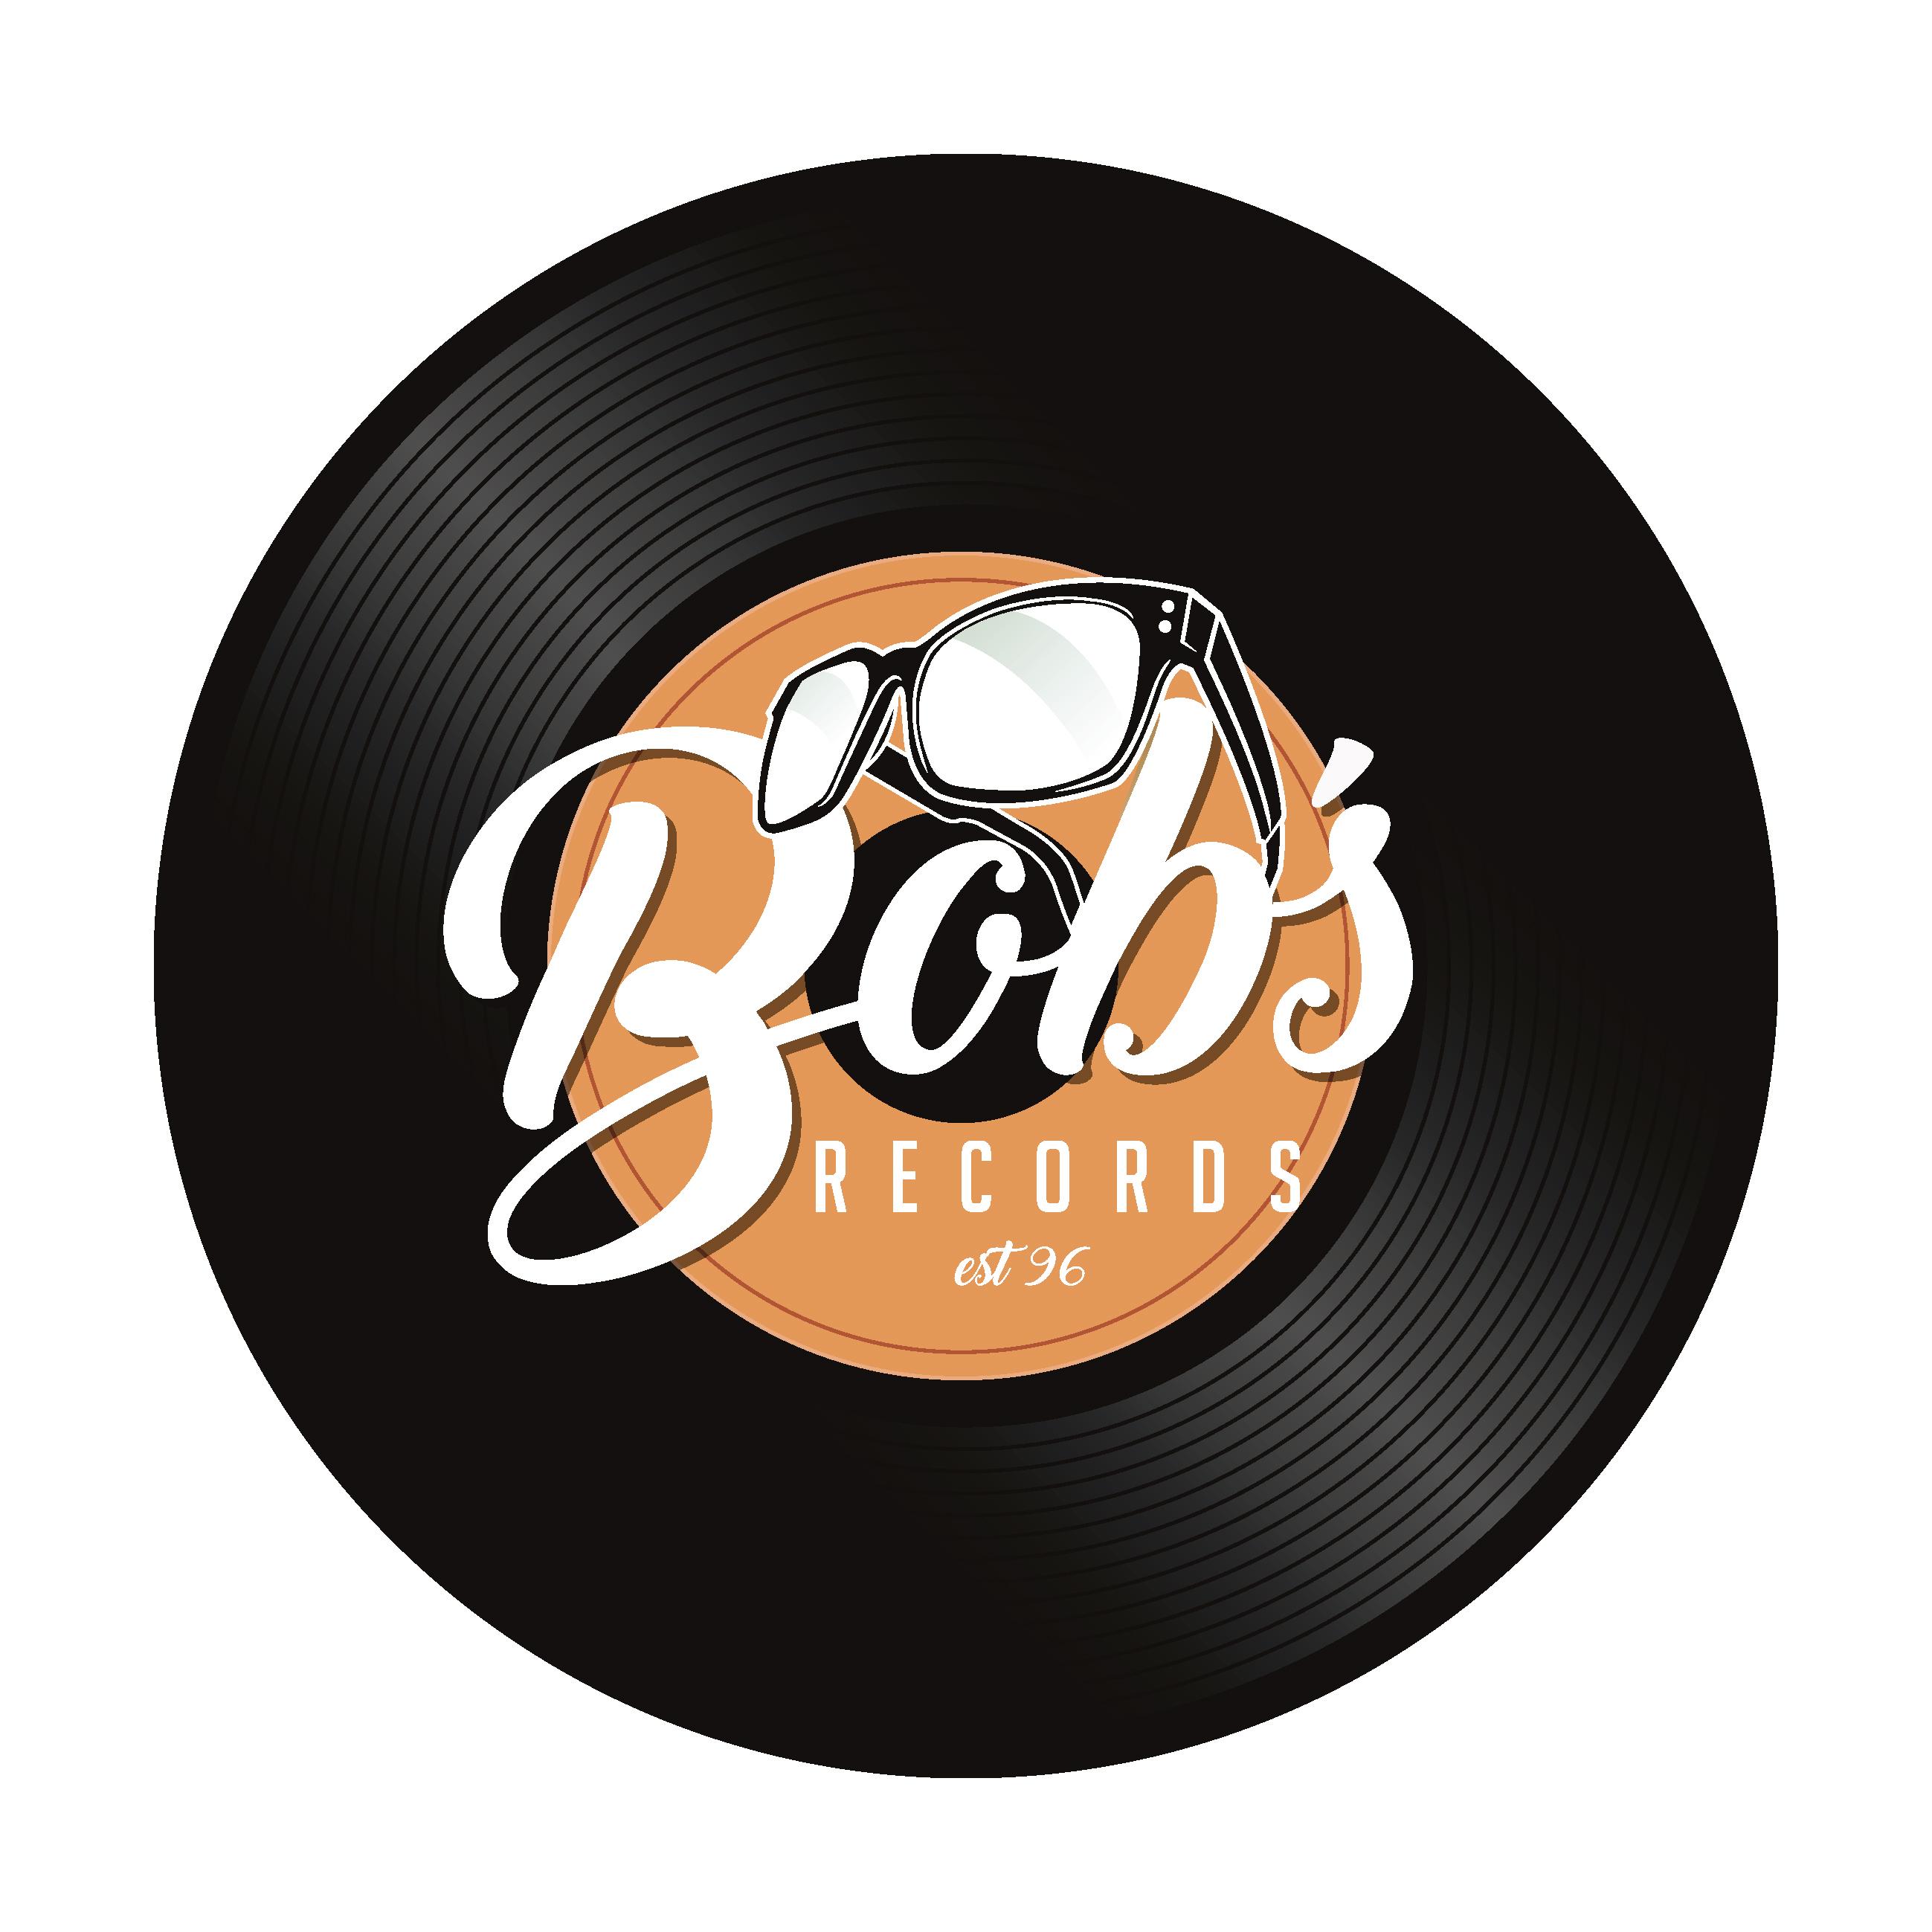 BOBS RECORDS